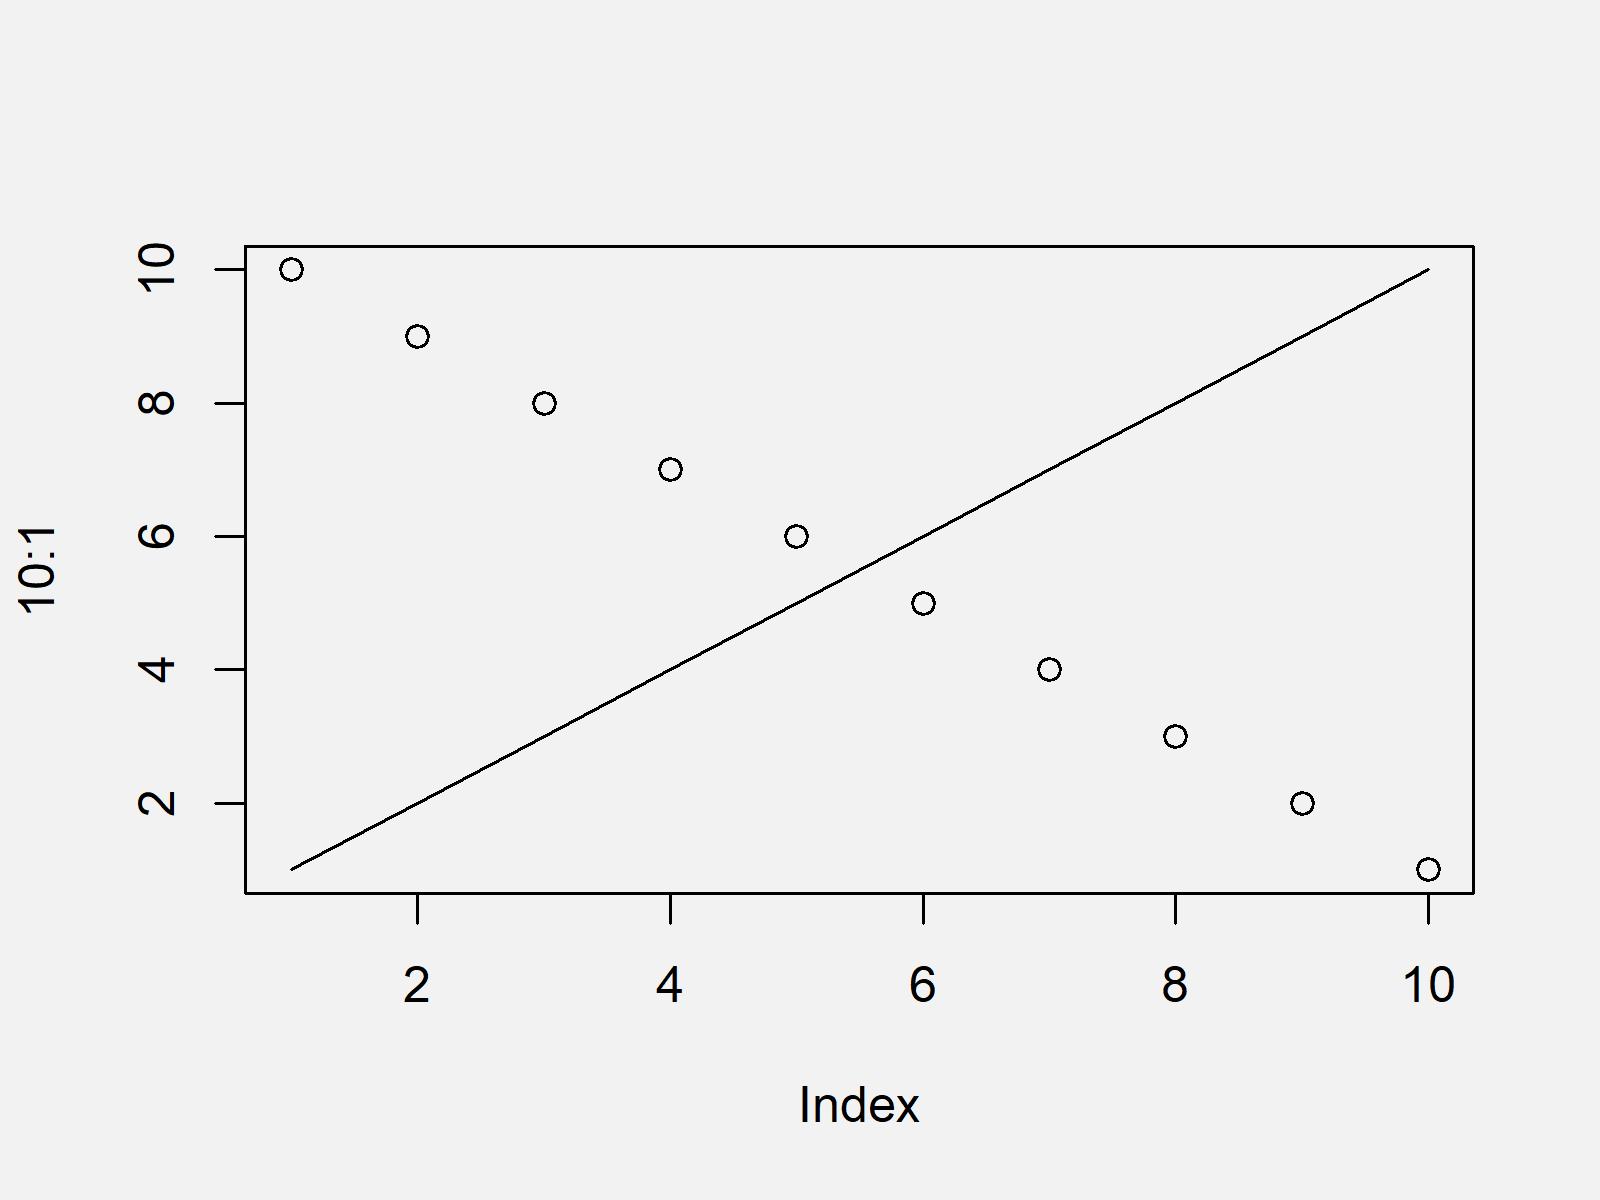 r graph figure 1 error new has not been called yet r